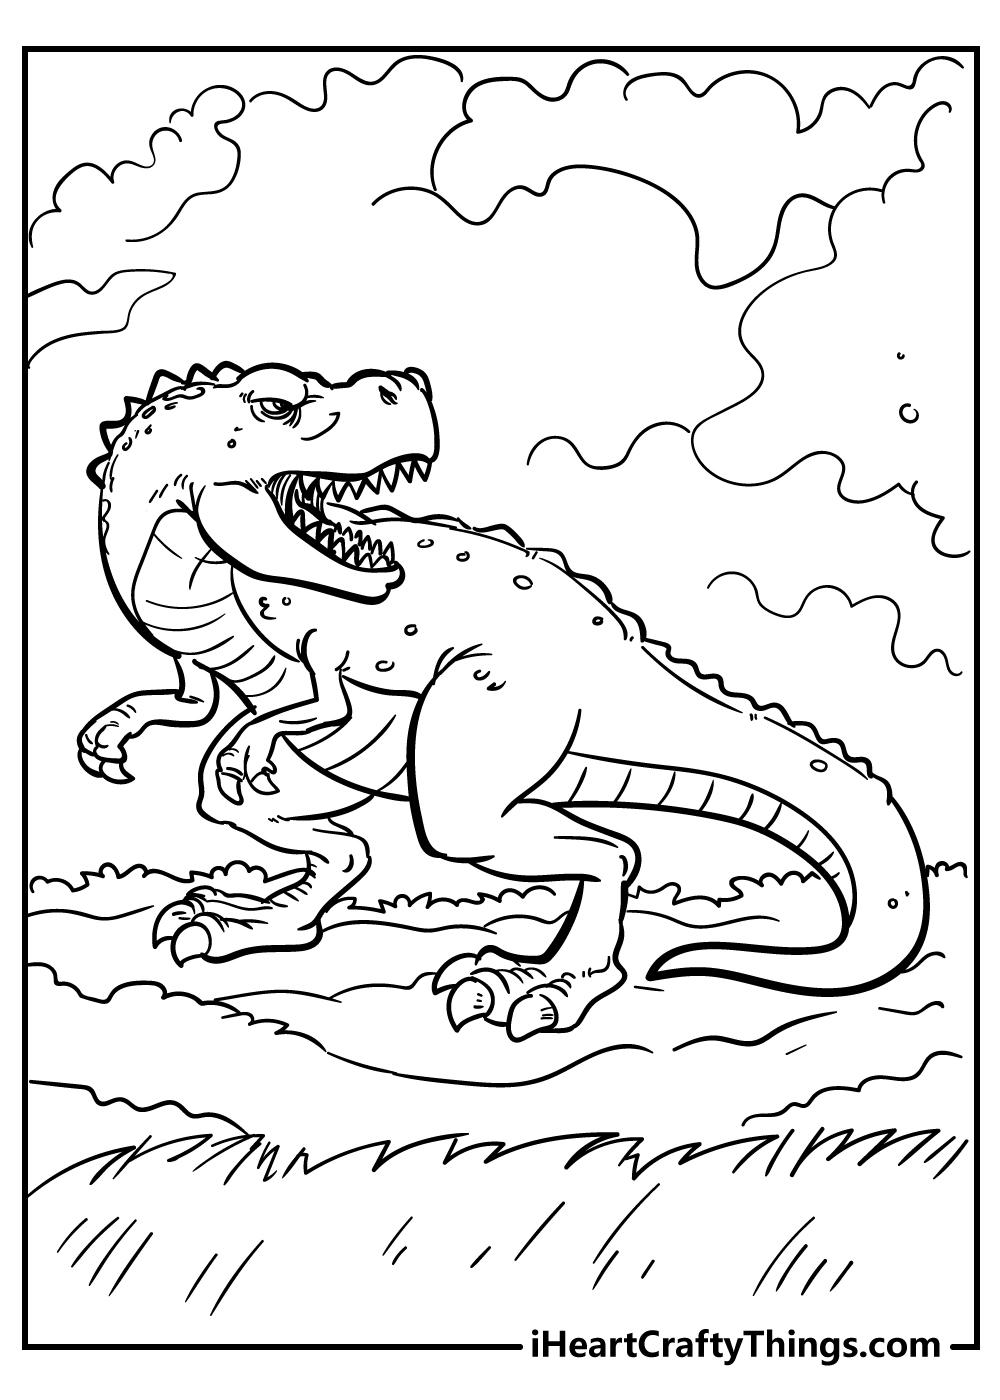 jurassic world t-rex coloring book free printable